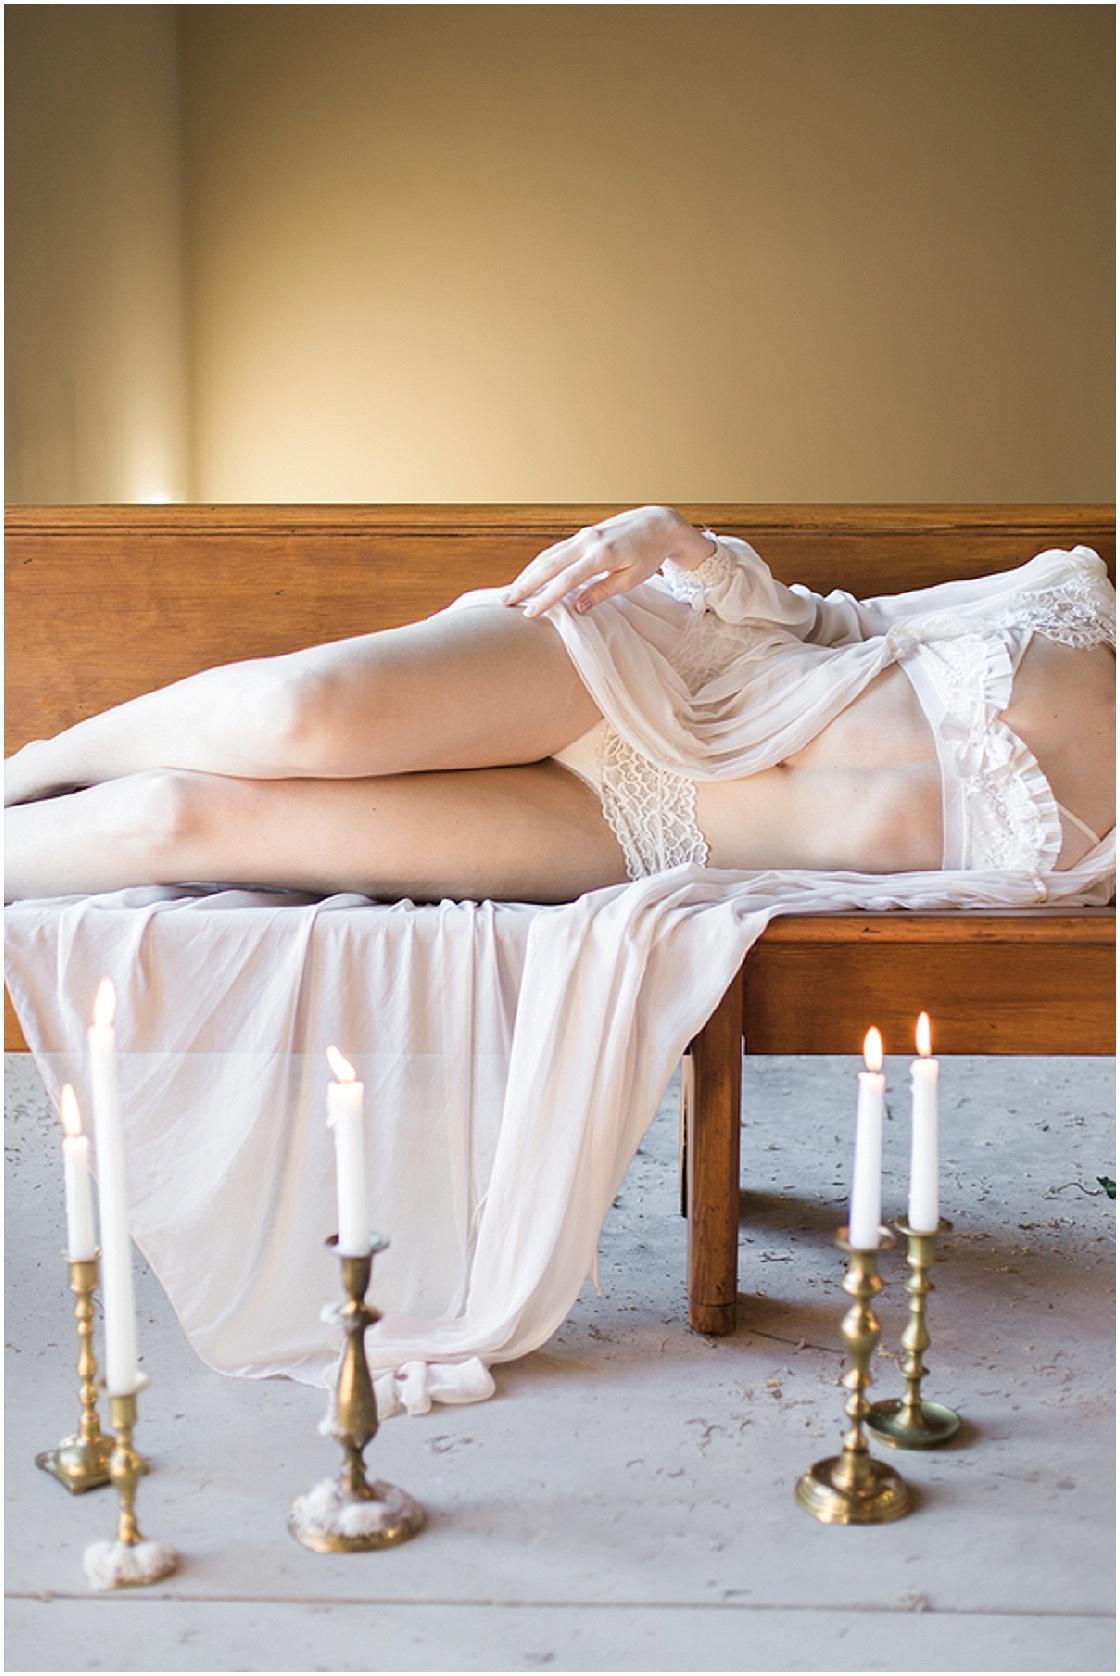 European Bridal Boudoir | Jennifer Munoz Photography | Joy Wed blog | JoyFoley Weddings | www.joy-wed.com